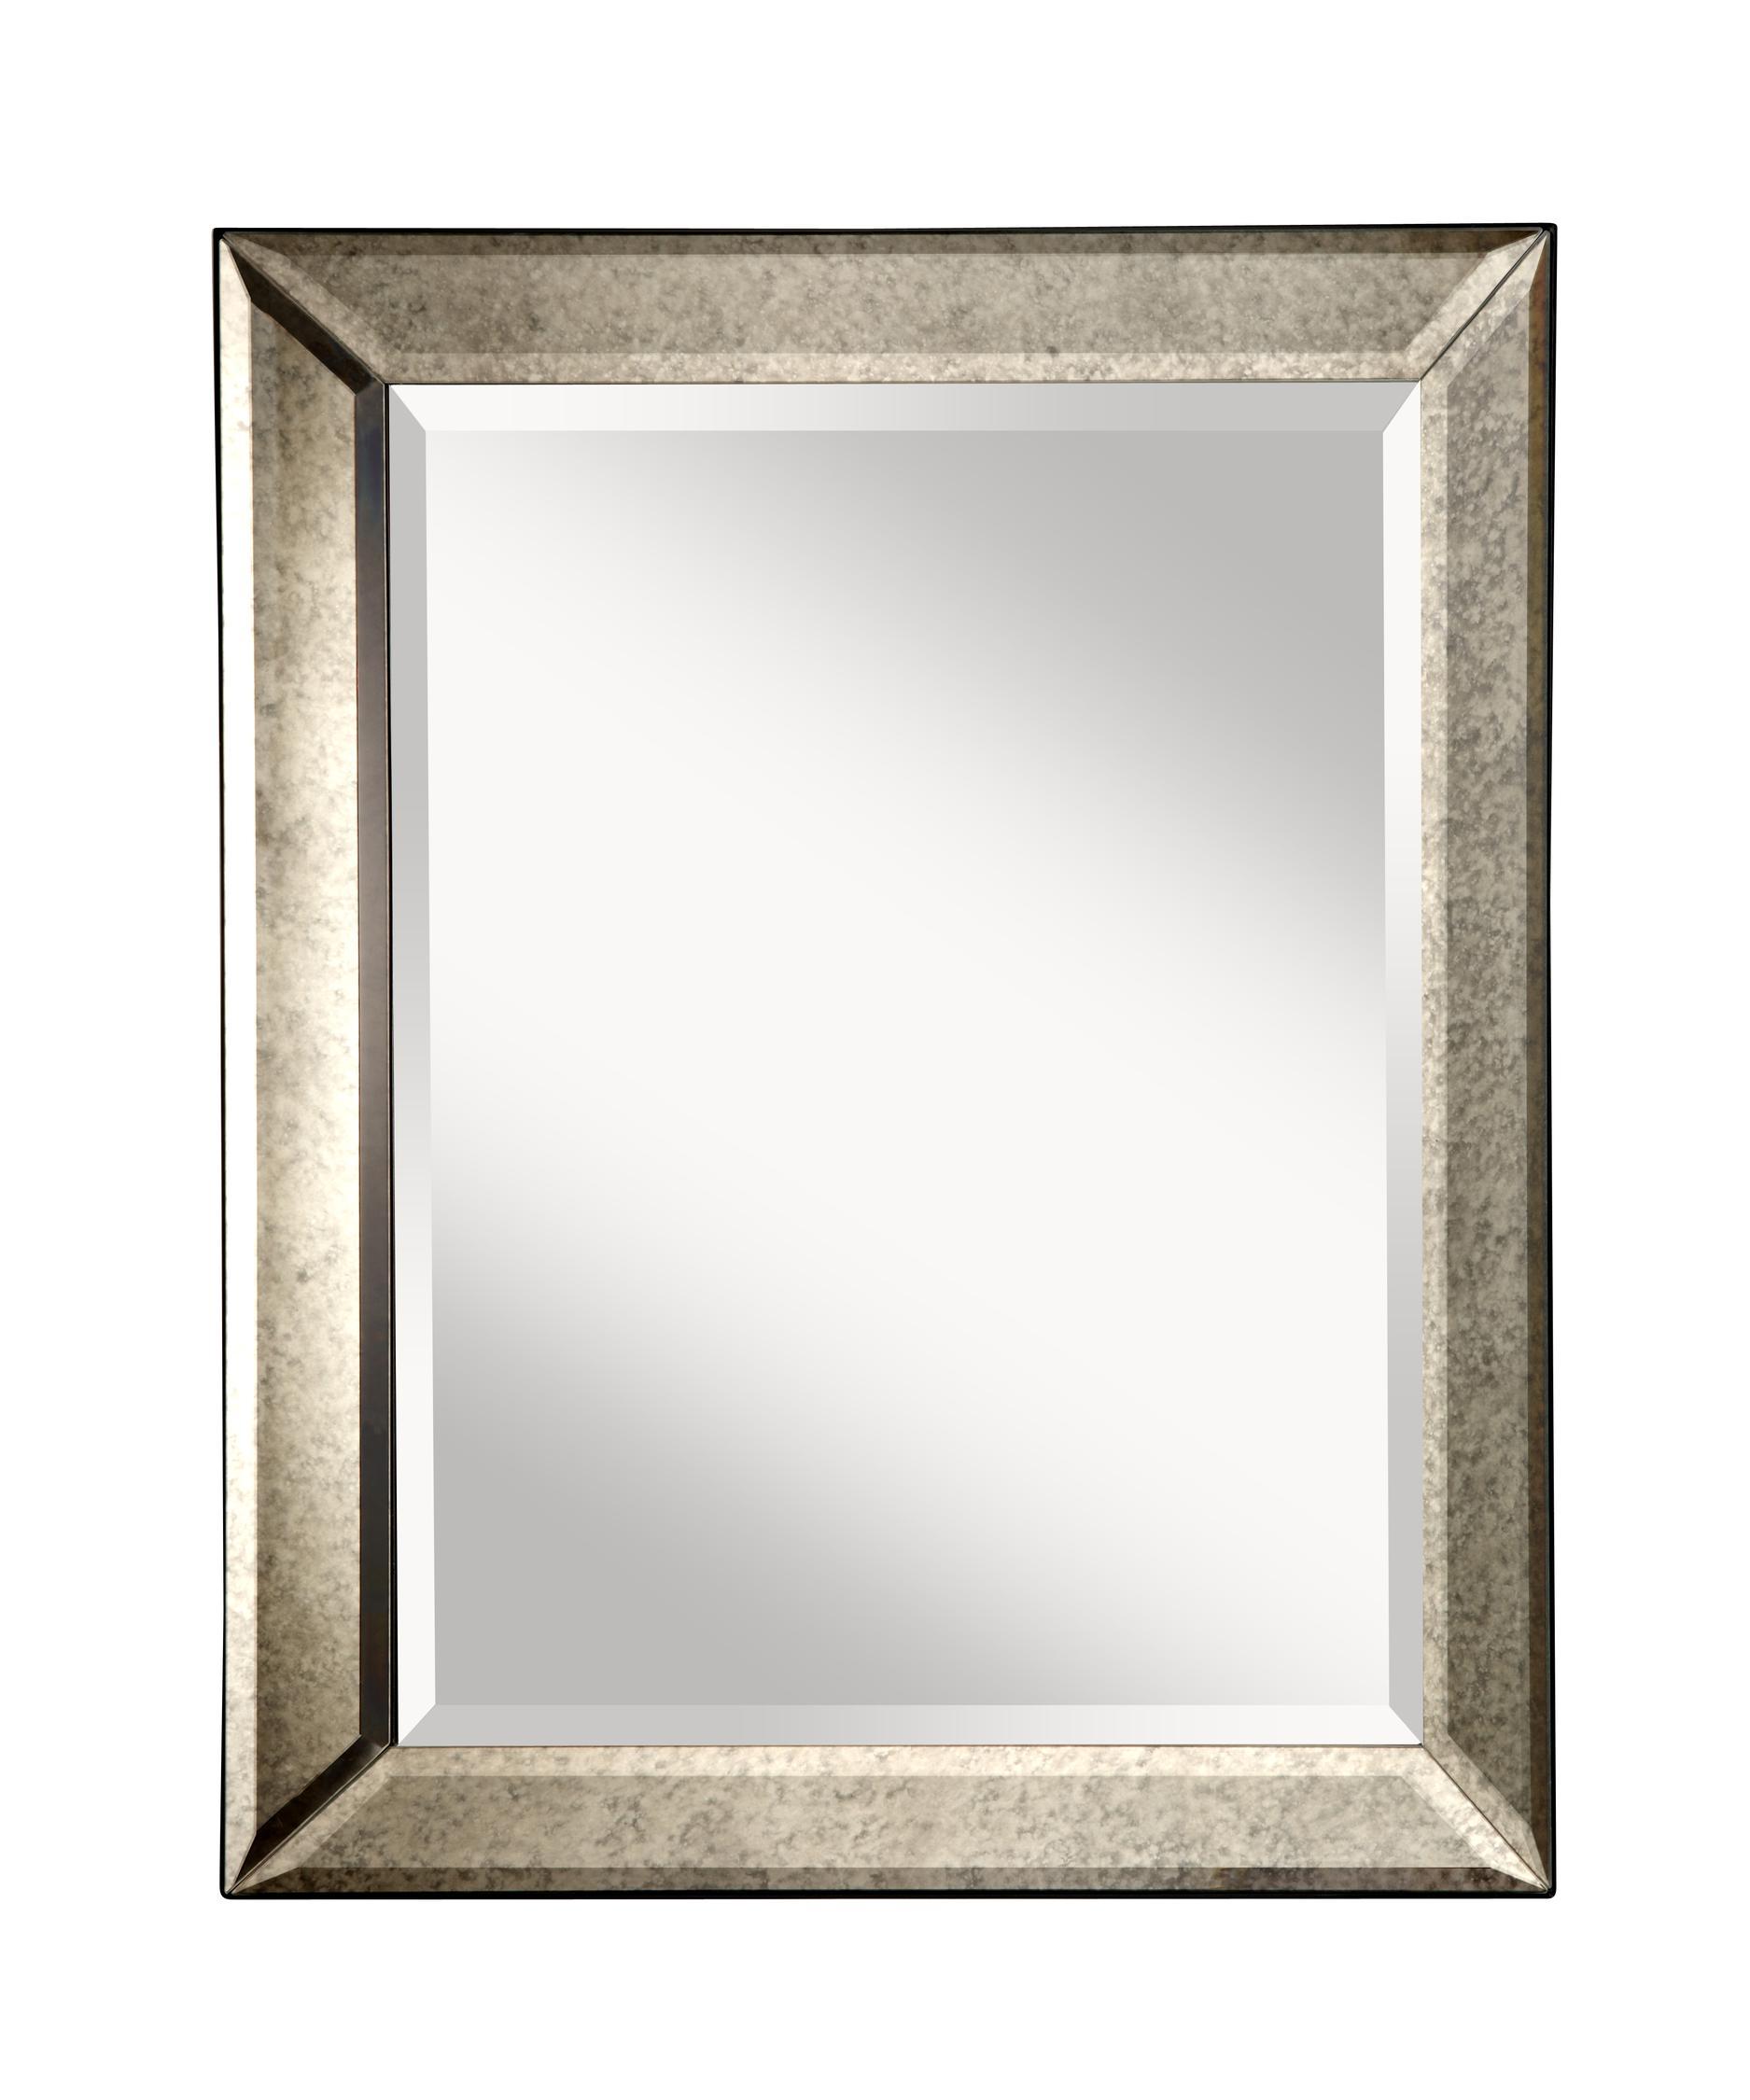 Murray Feiss Mr1141 Antiqua Rectangular Wall Mirror Capitol Lighting 1